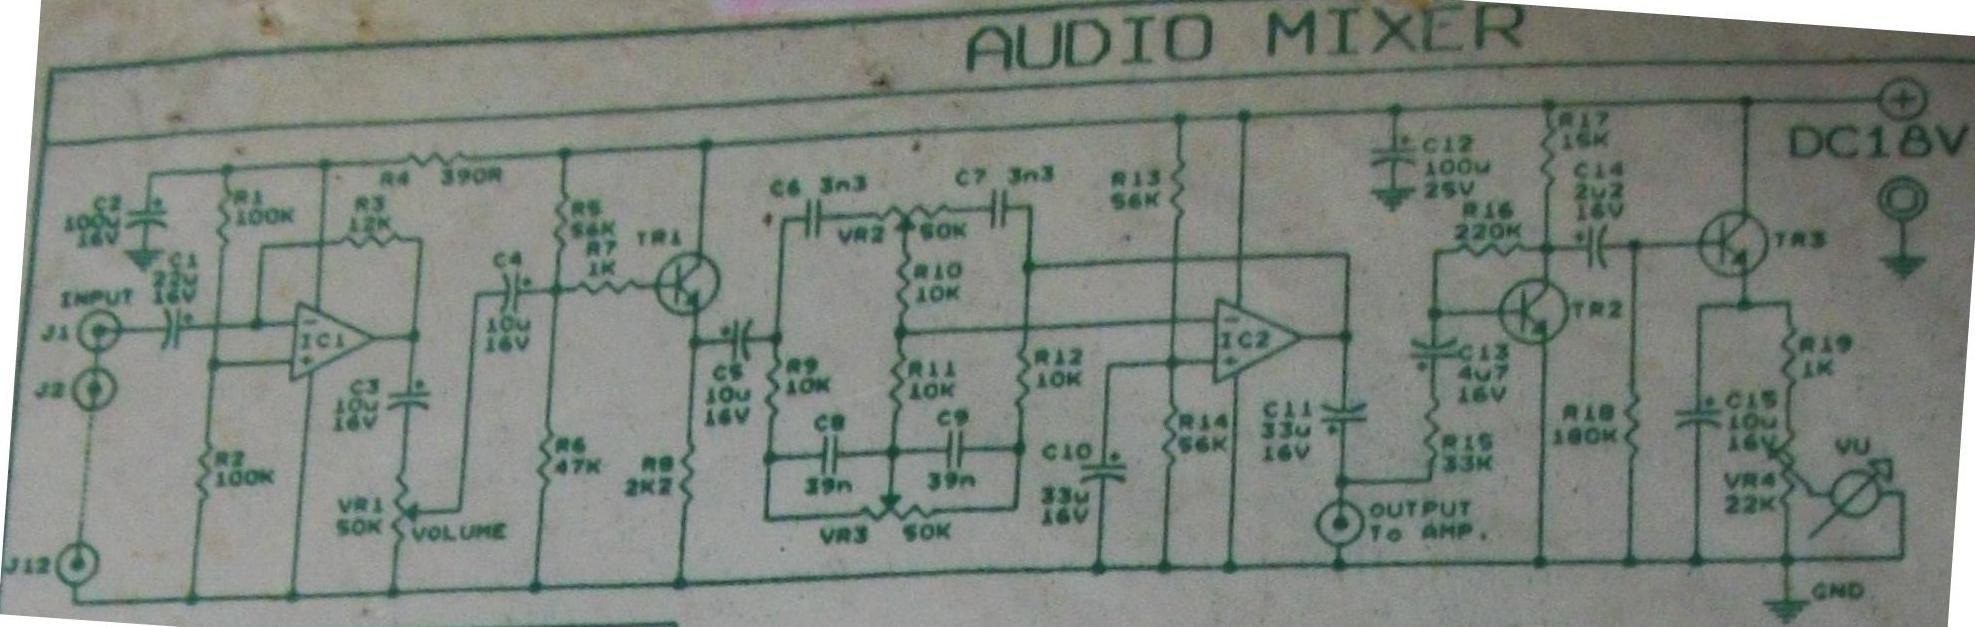 audio mixer vu meter circuit schematic rh circuitscheme com